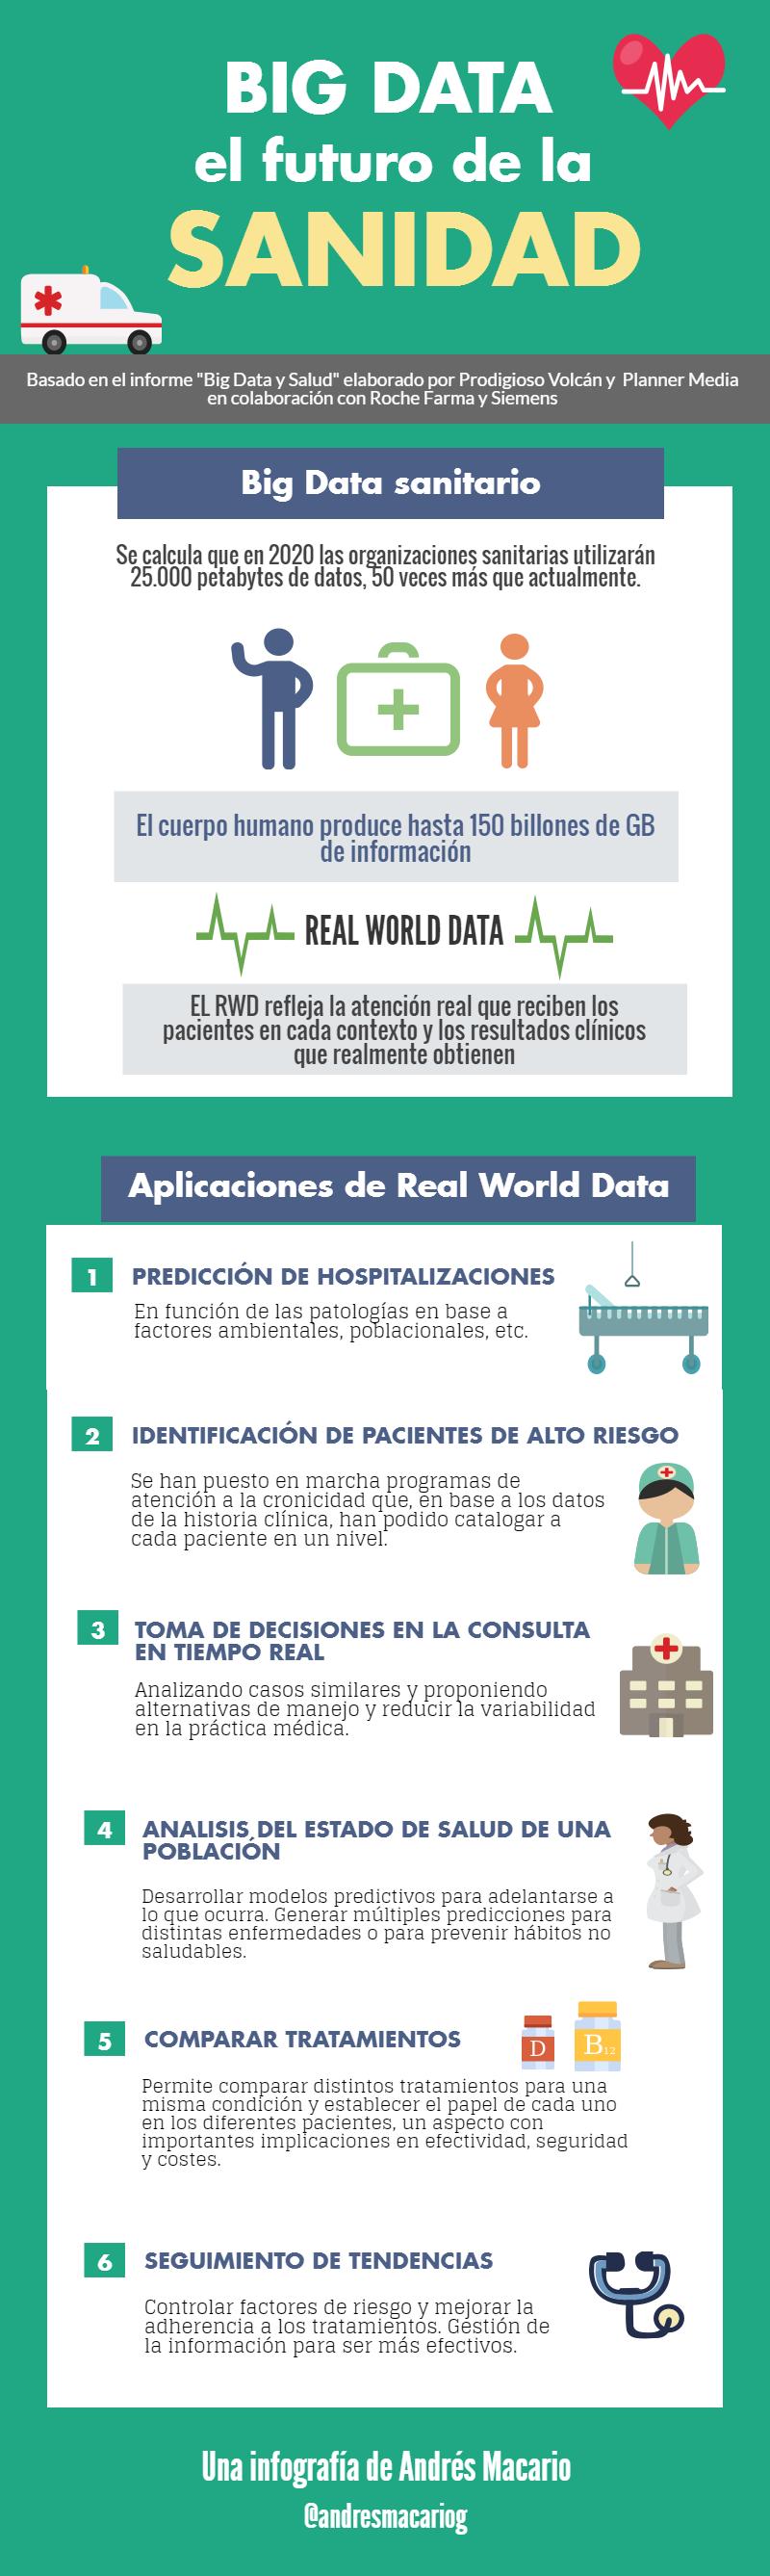 Big Data futuro de la sanidad- Infografia Andres Macario